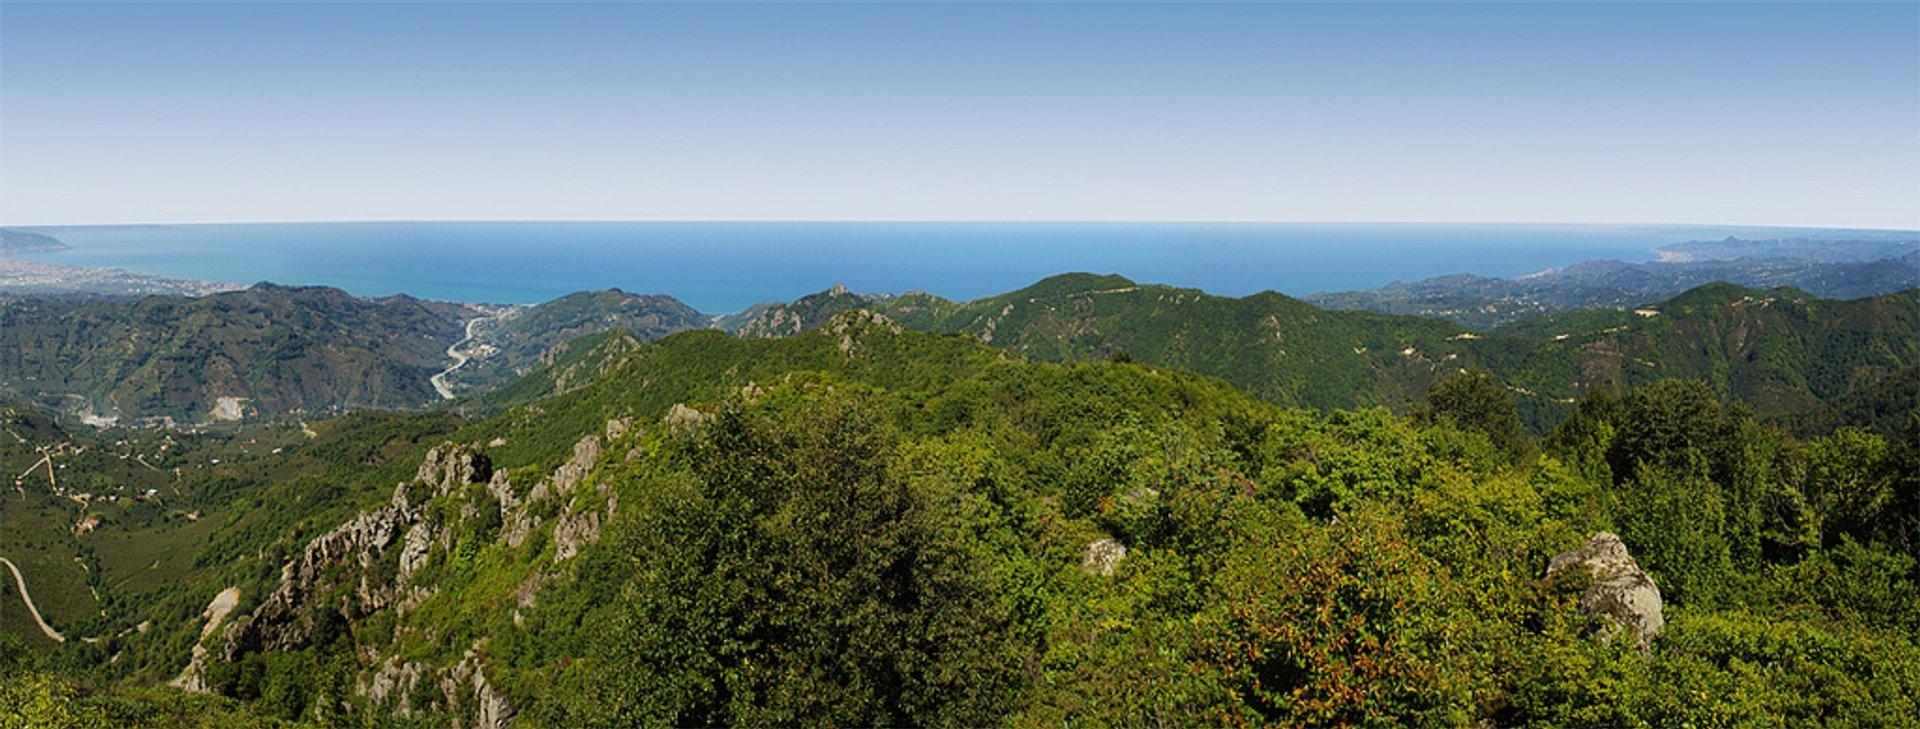 Black Sea coast near Ordu, Turkey 2020